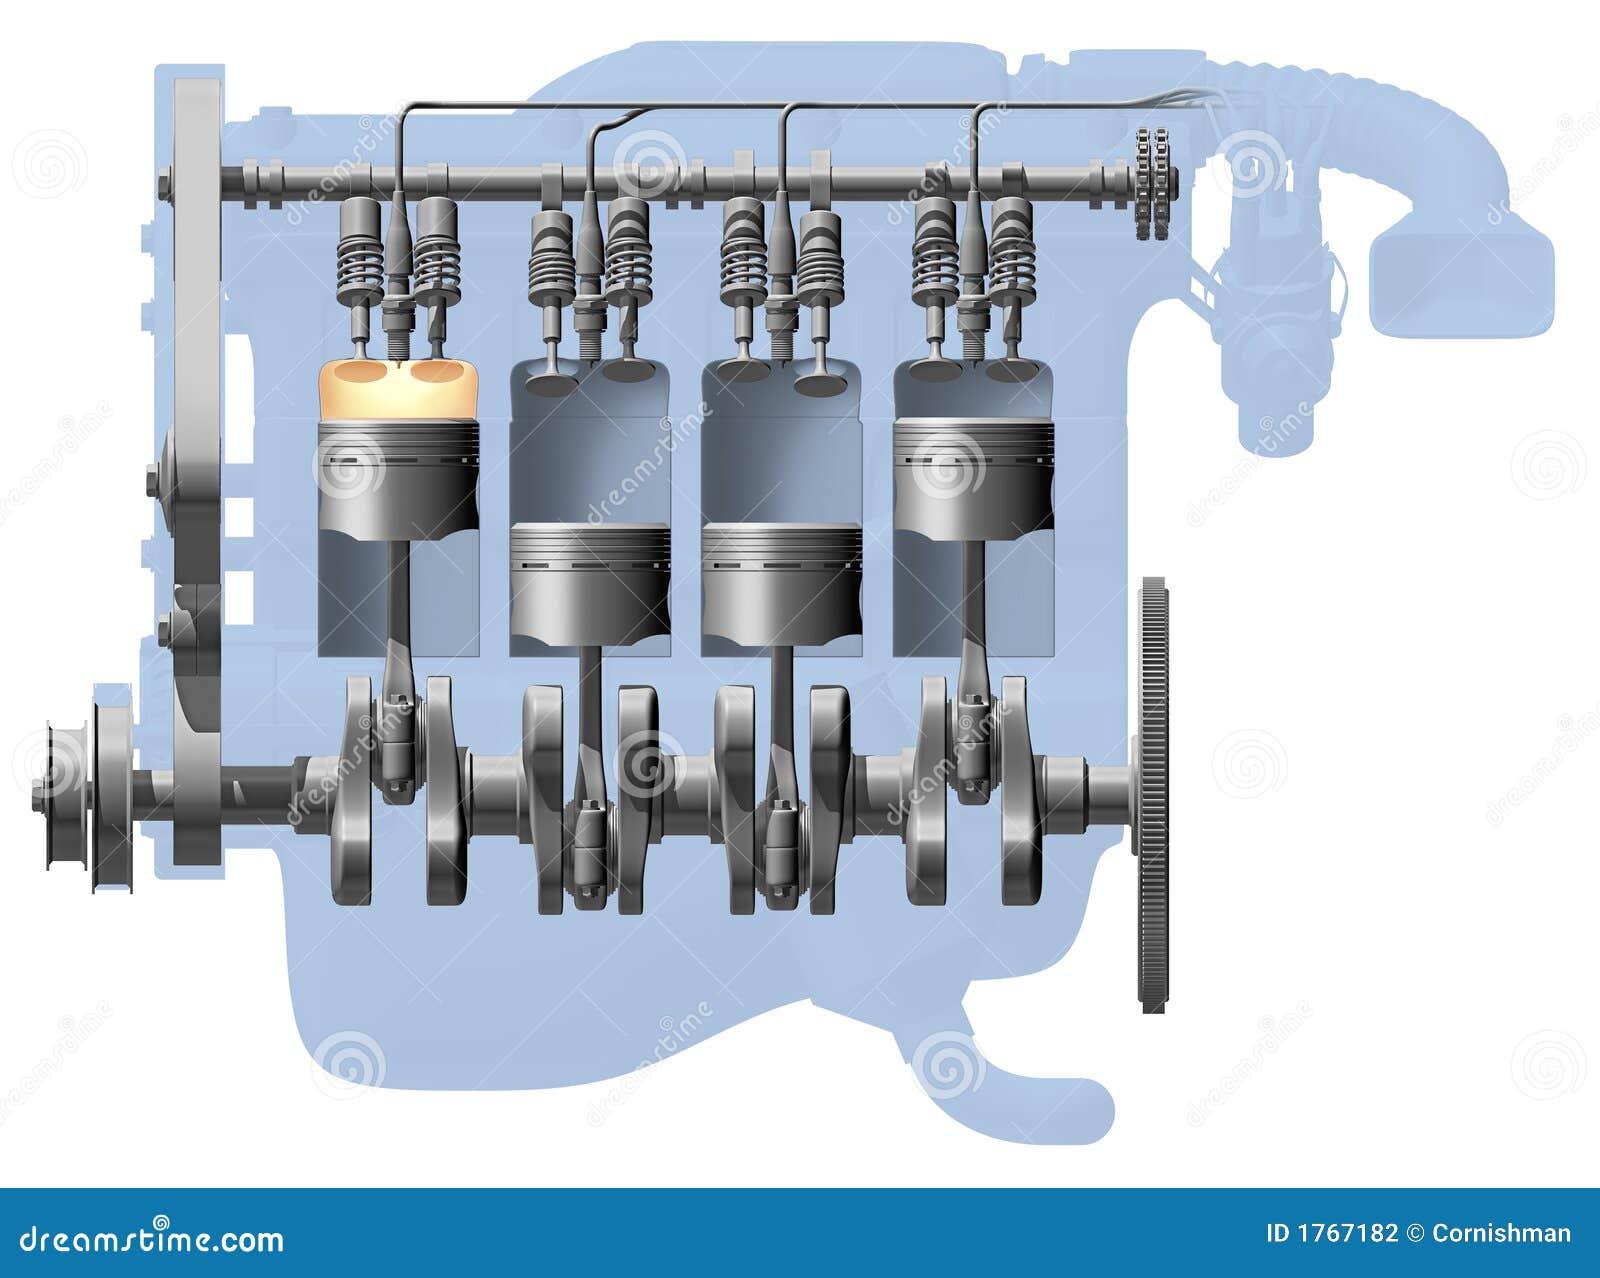 Cutawaymotor